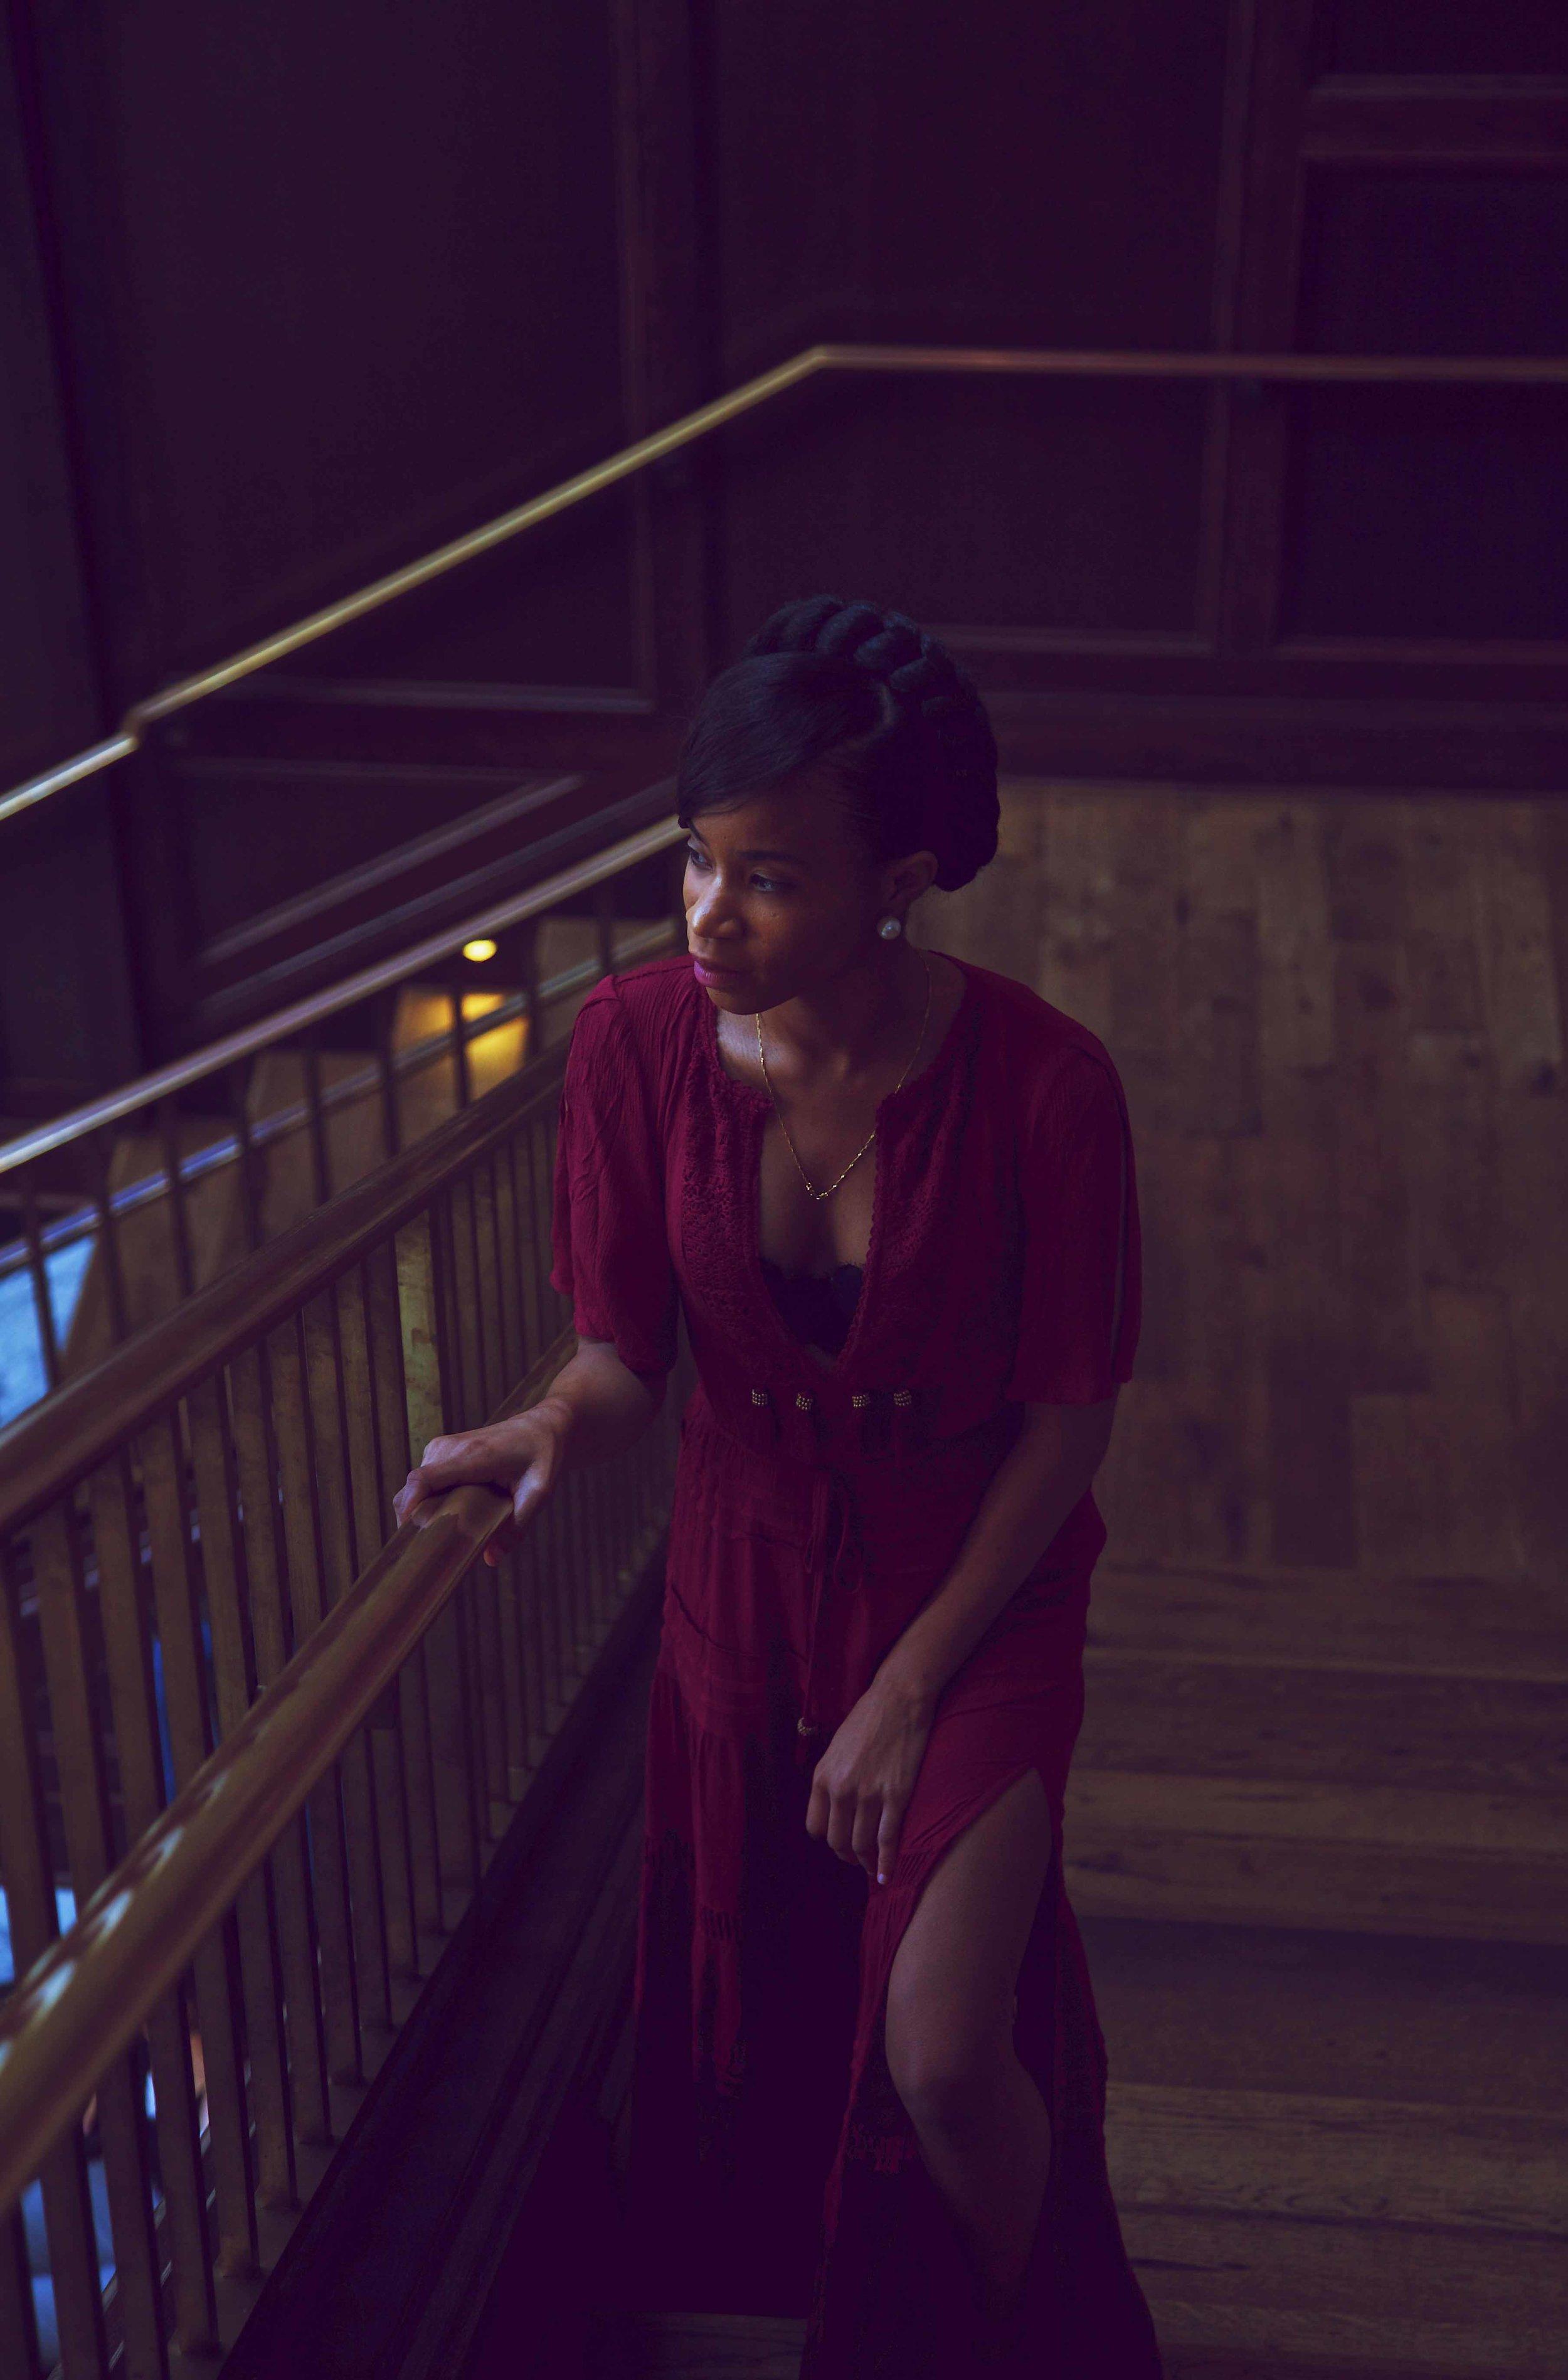 2018.3.3 Kayla Boronell by StanChambersJr Photography 8 small.jpg